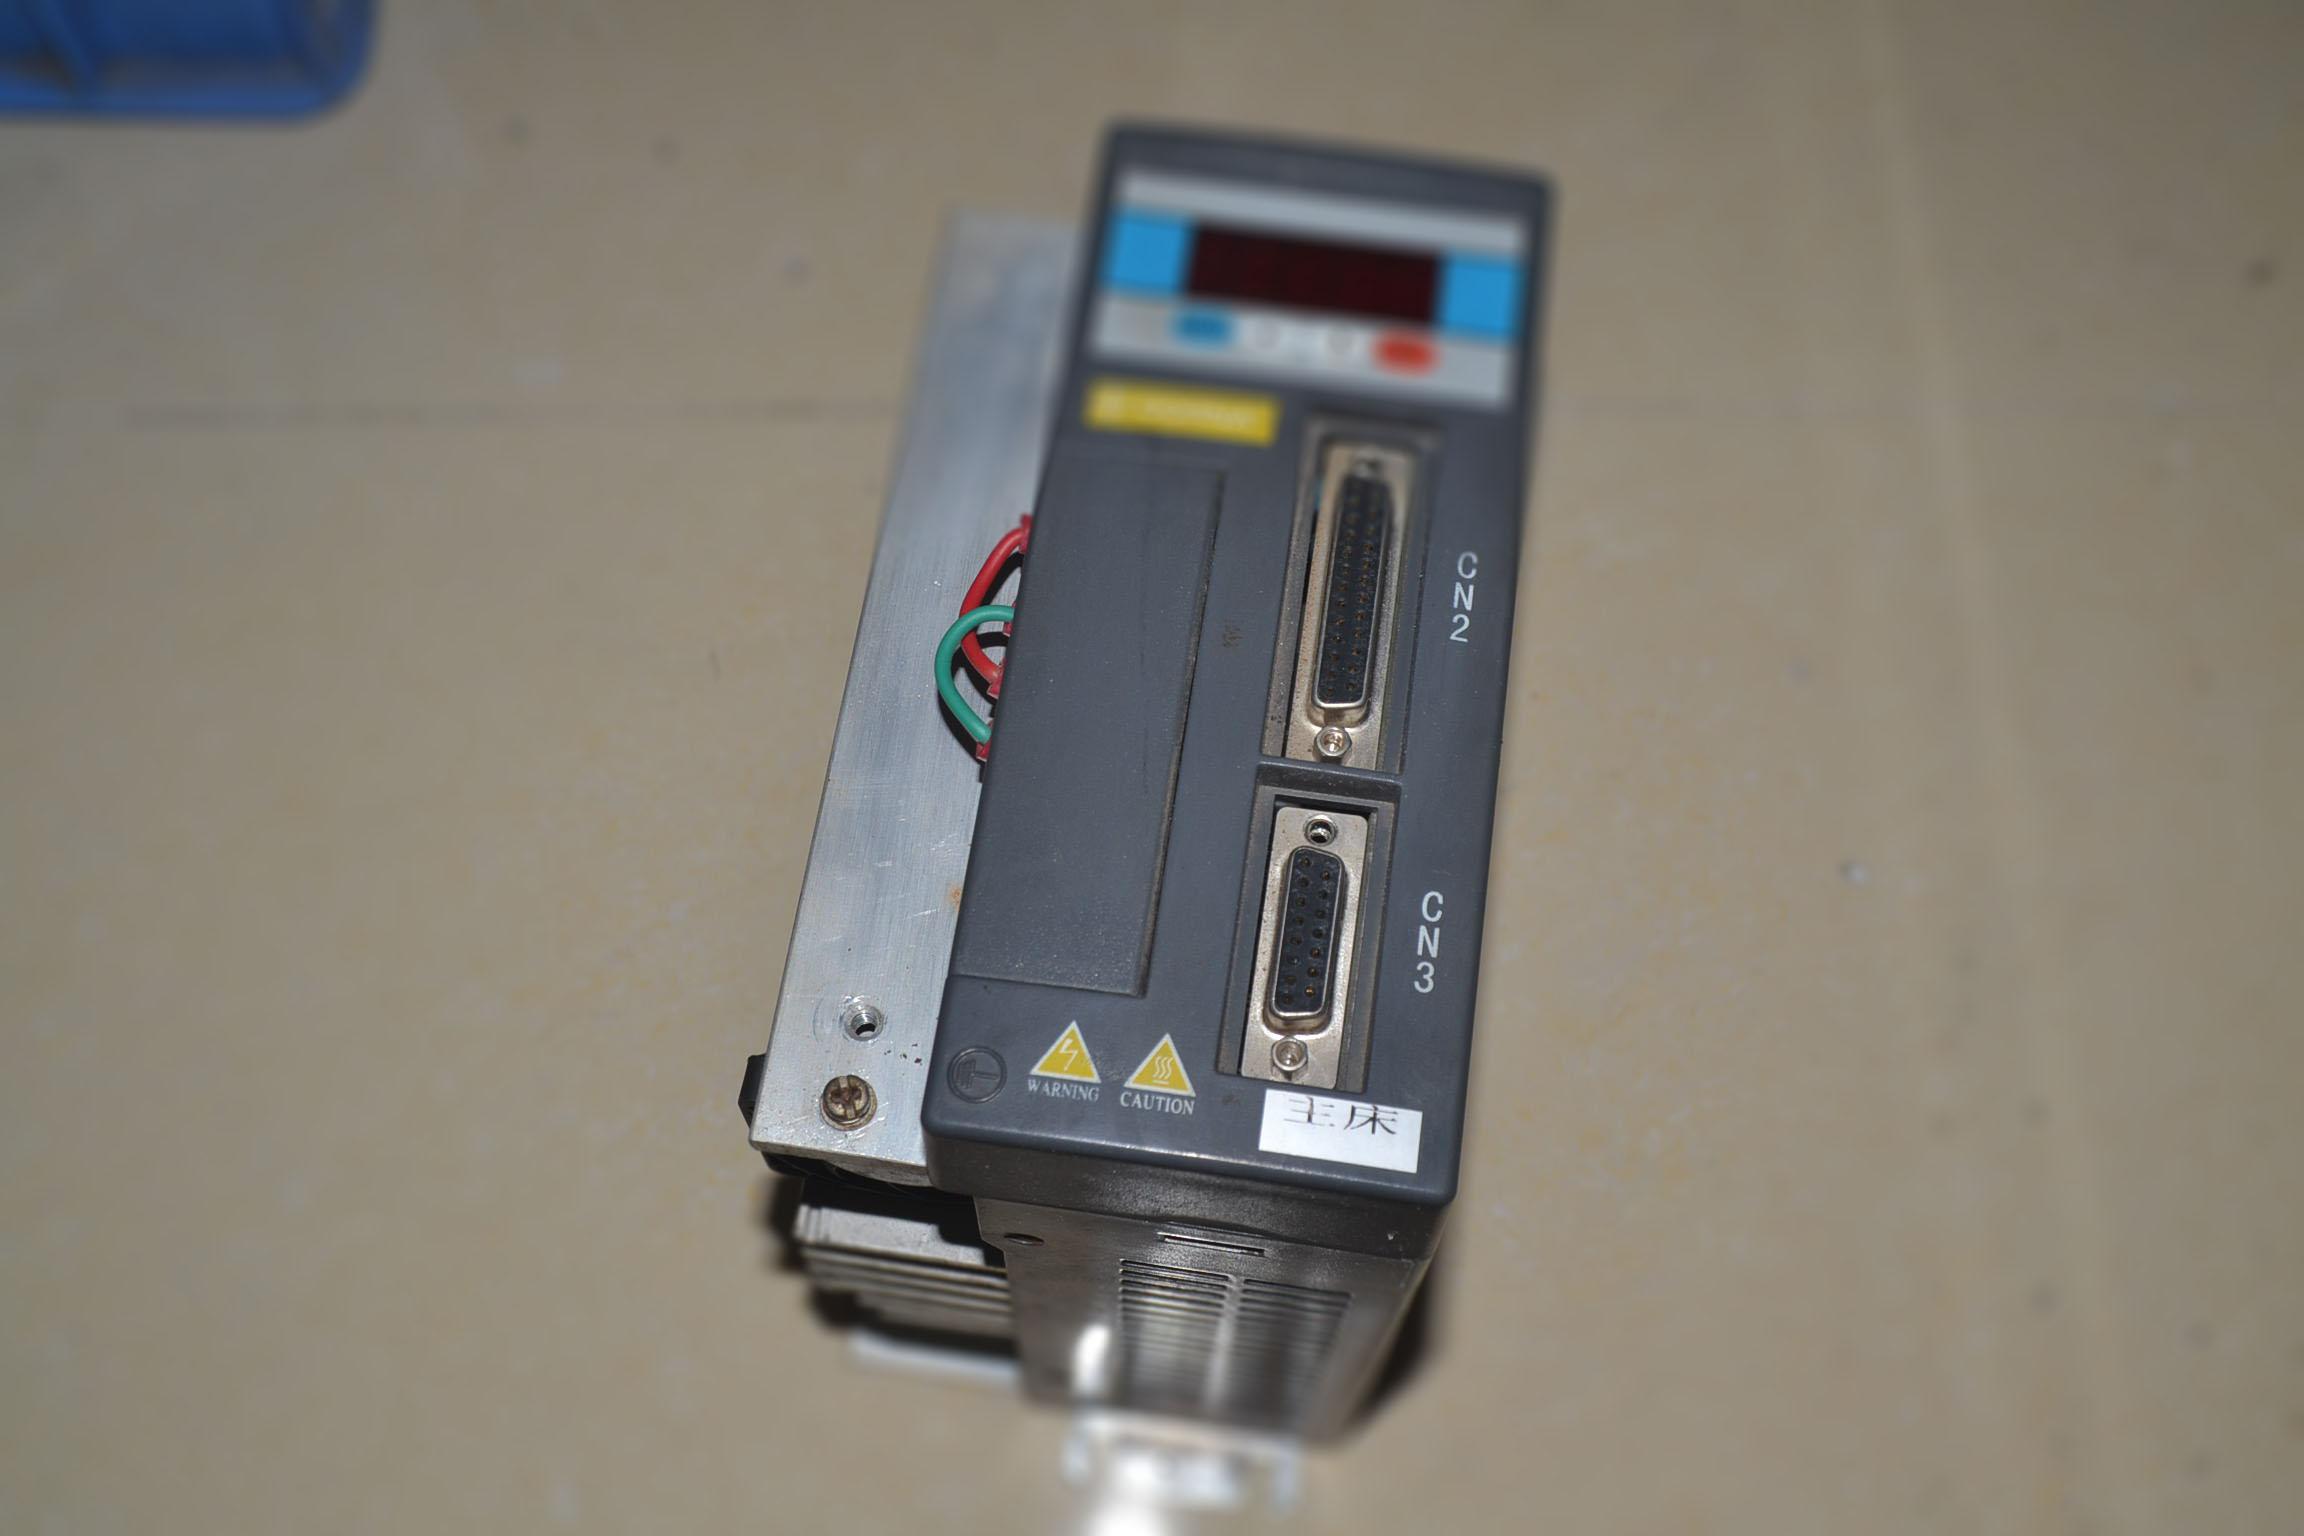 Servo Driver  EPS-HB0001123-2003 2004 1kW 220V 4.5A